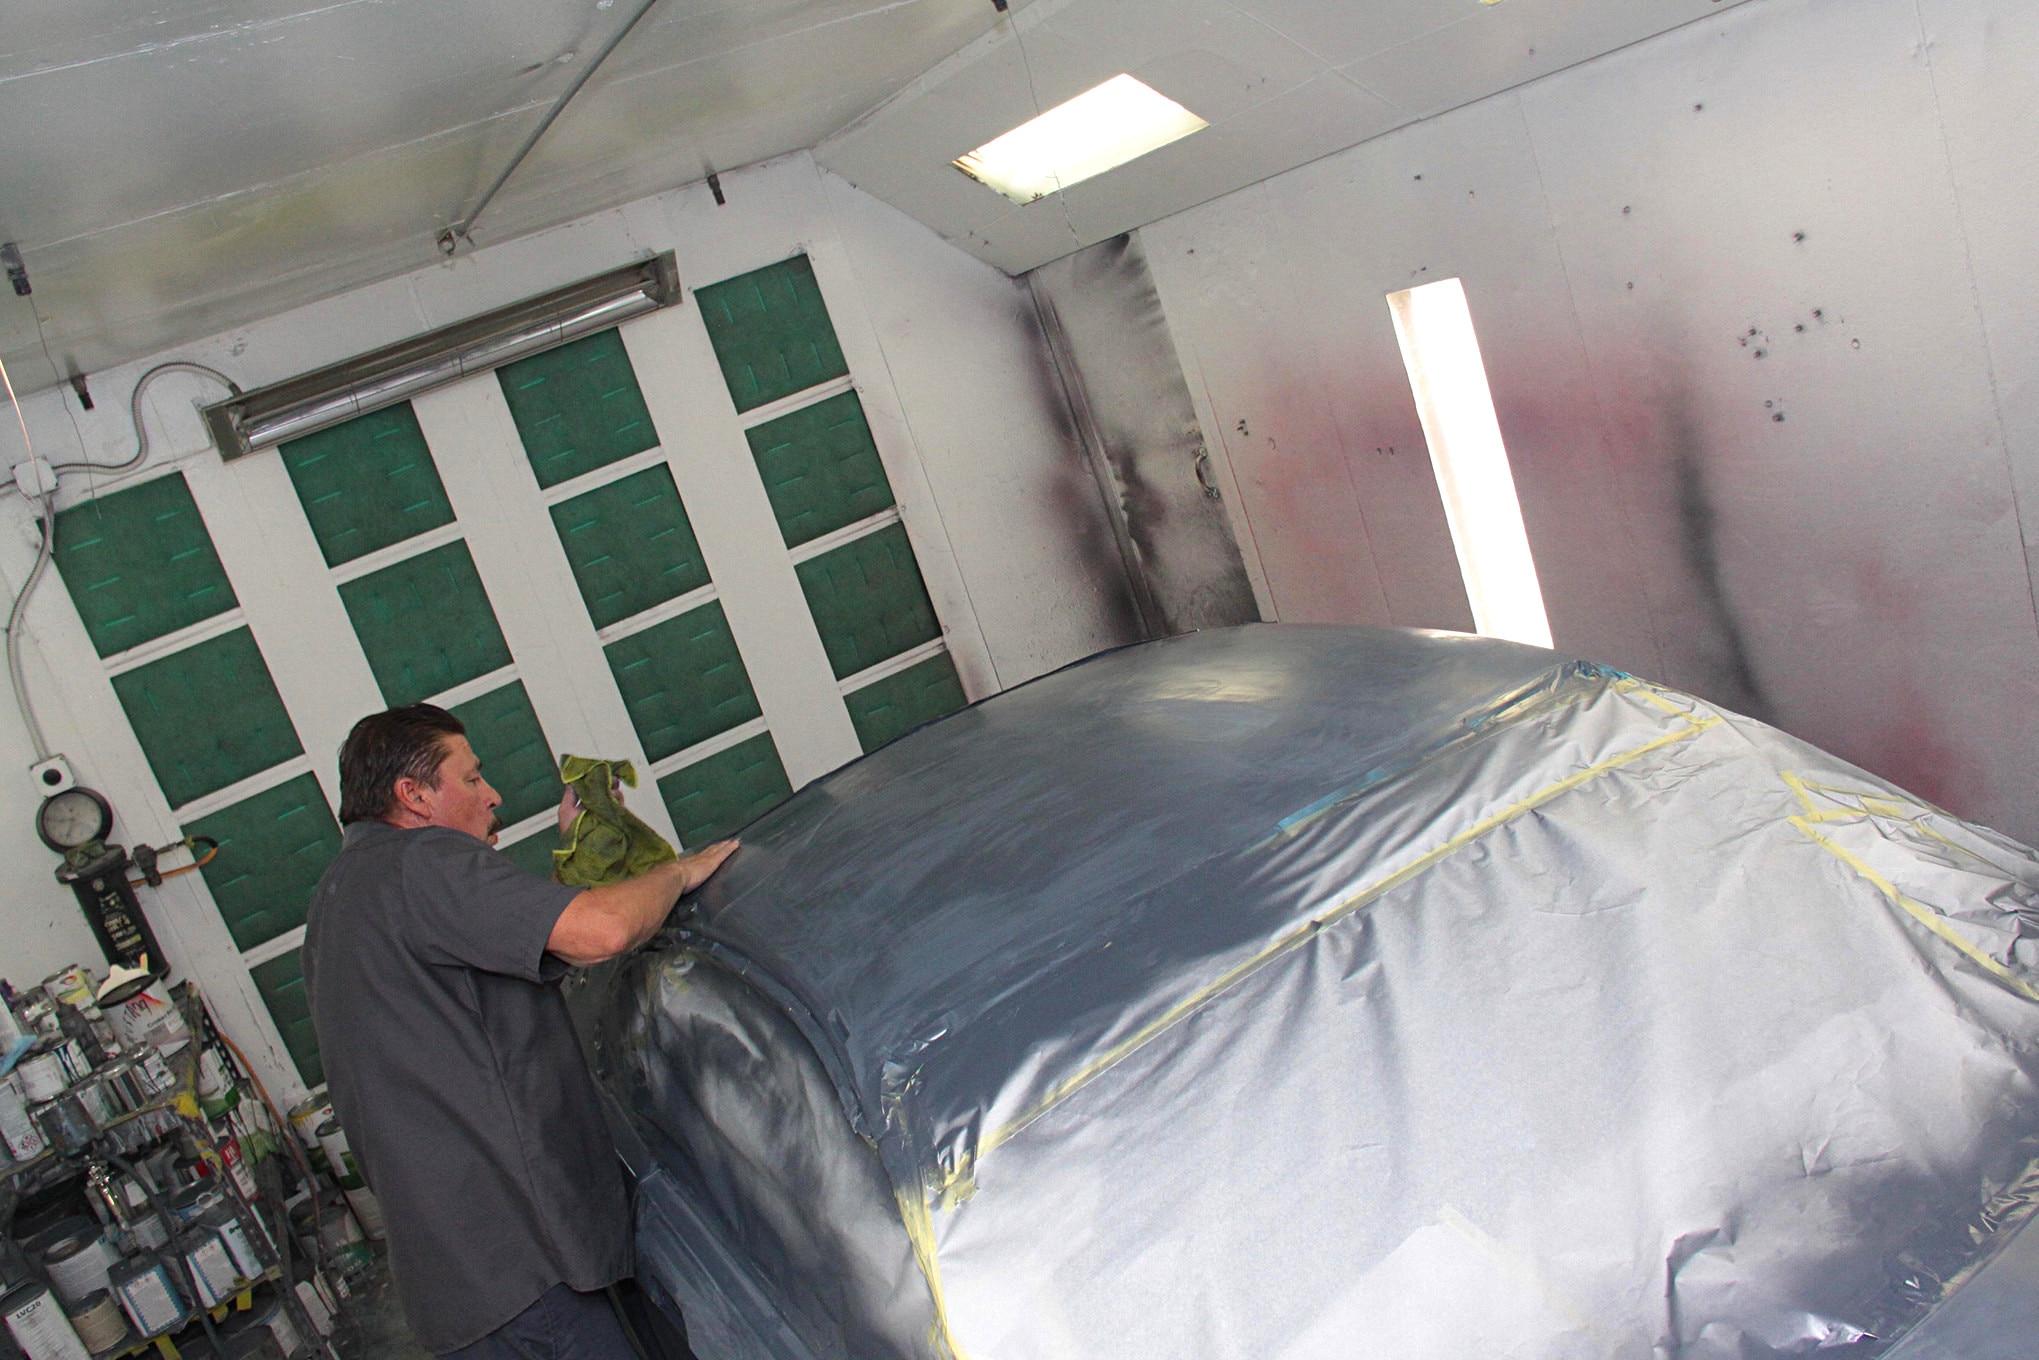 005 1999 Mustang Gt Paint Preparation Axalta Fitment